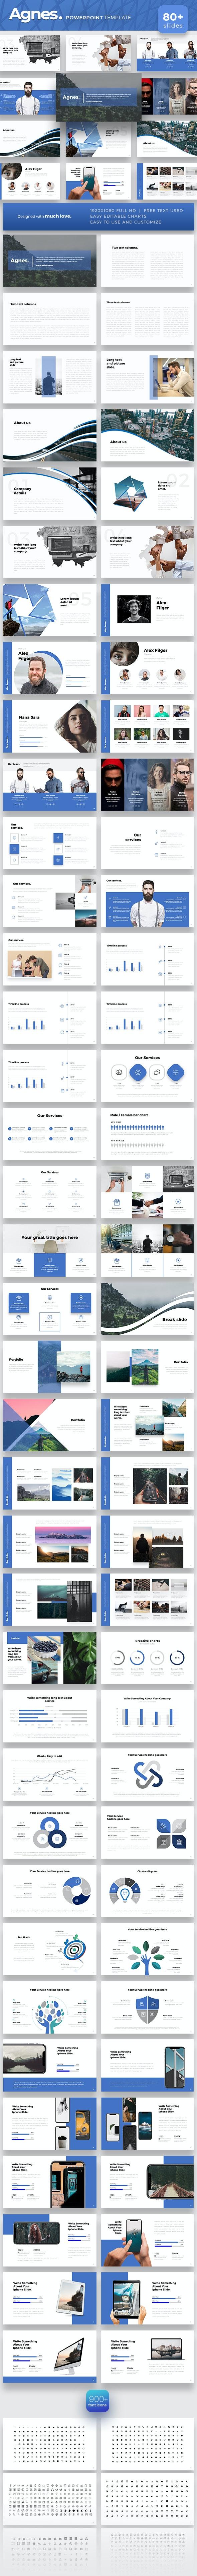 Agnes Powerpoint Template - PowerPoint Templates Presentation Templates